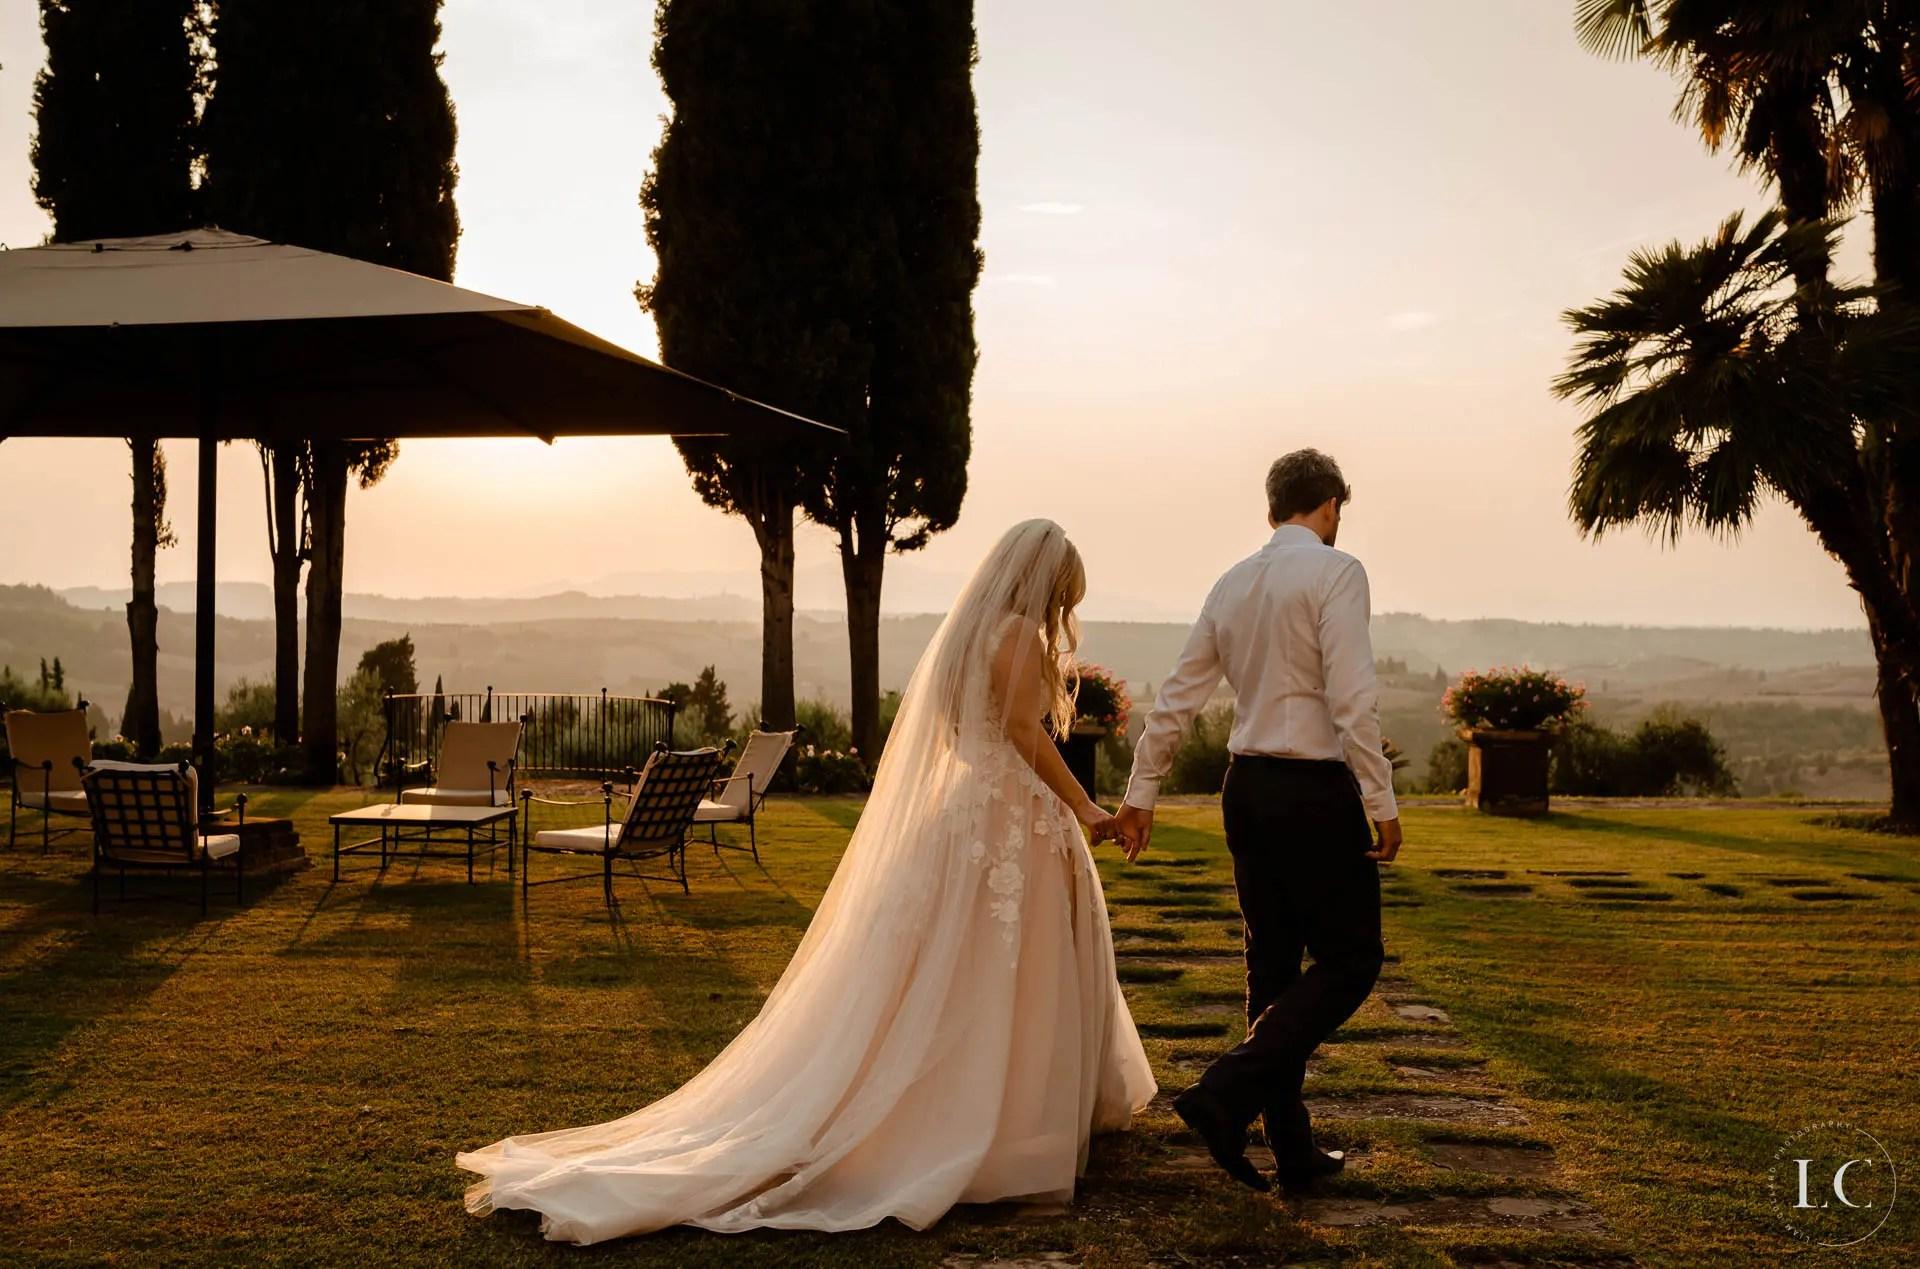 Choose a destination wedding